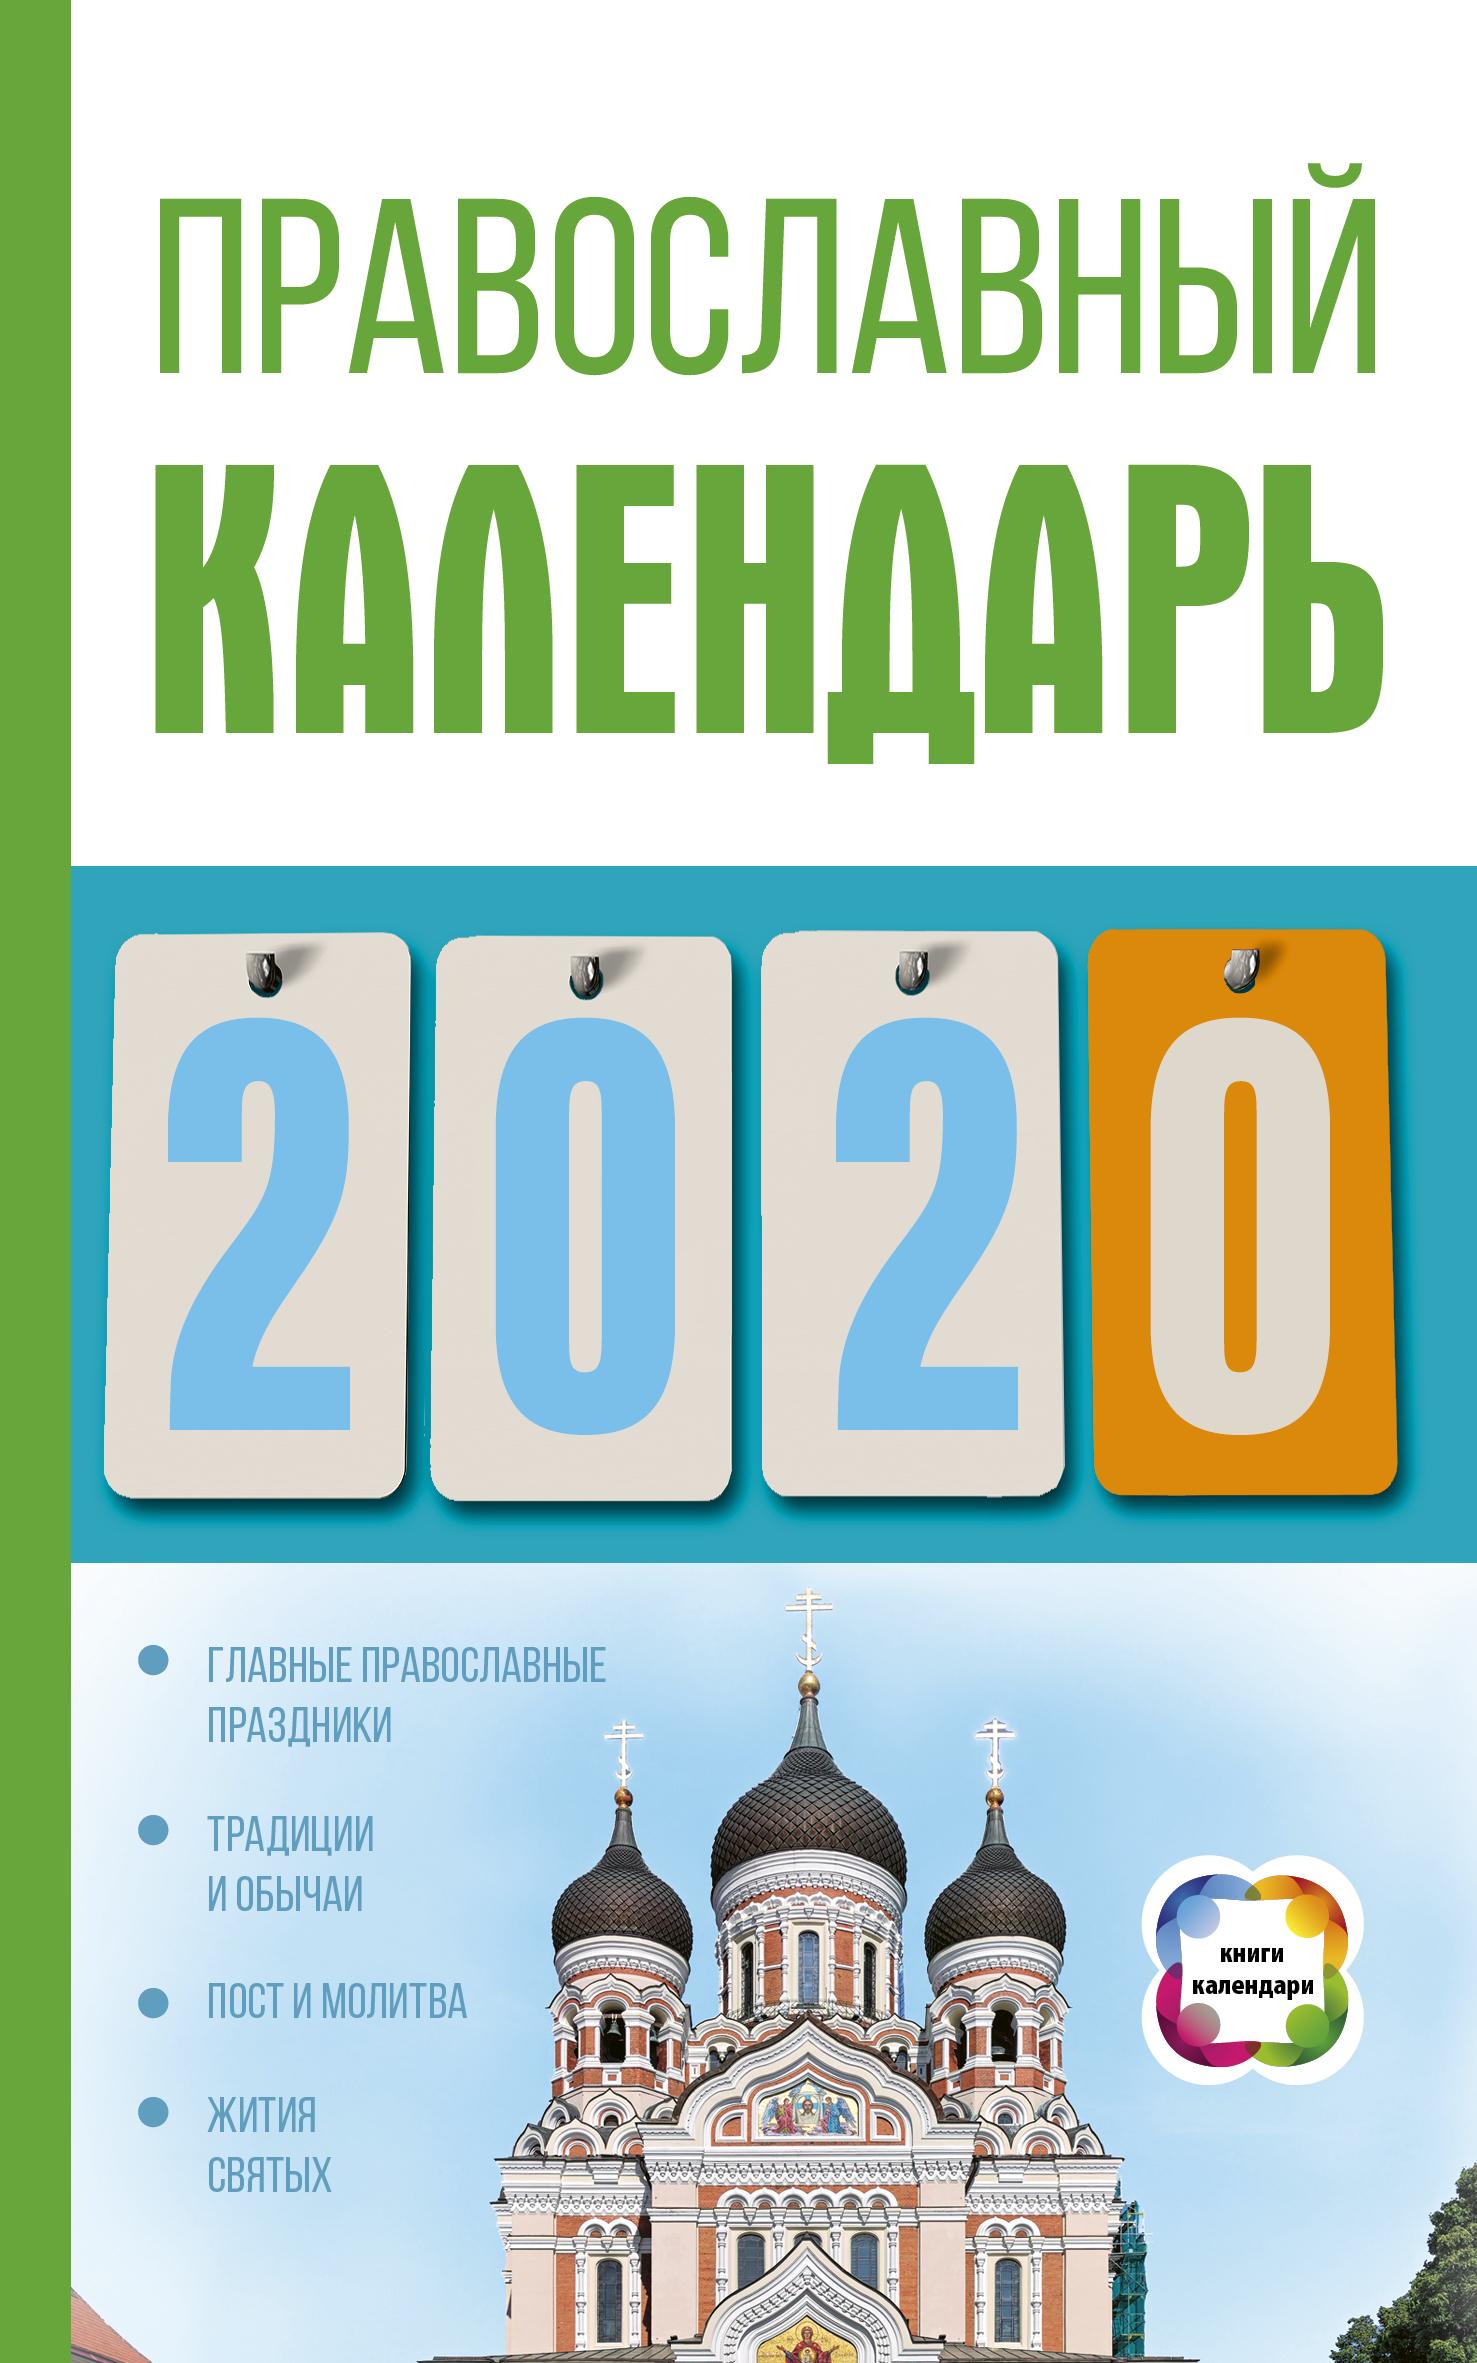 Православный календарь на 2020 год ( Хорсанд-Мавроматис Диана  )